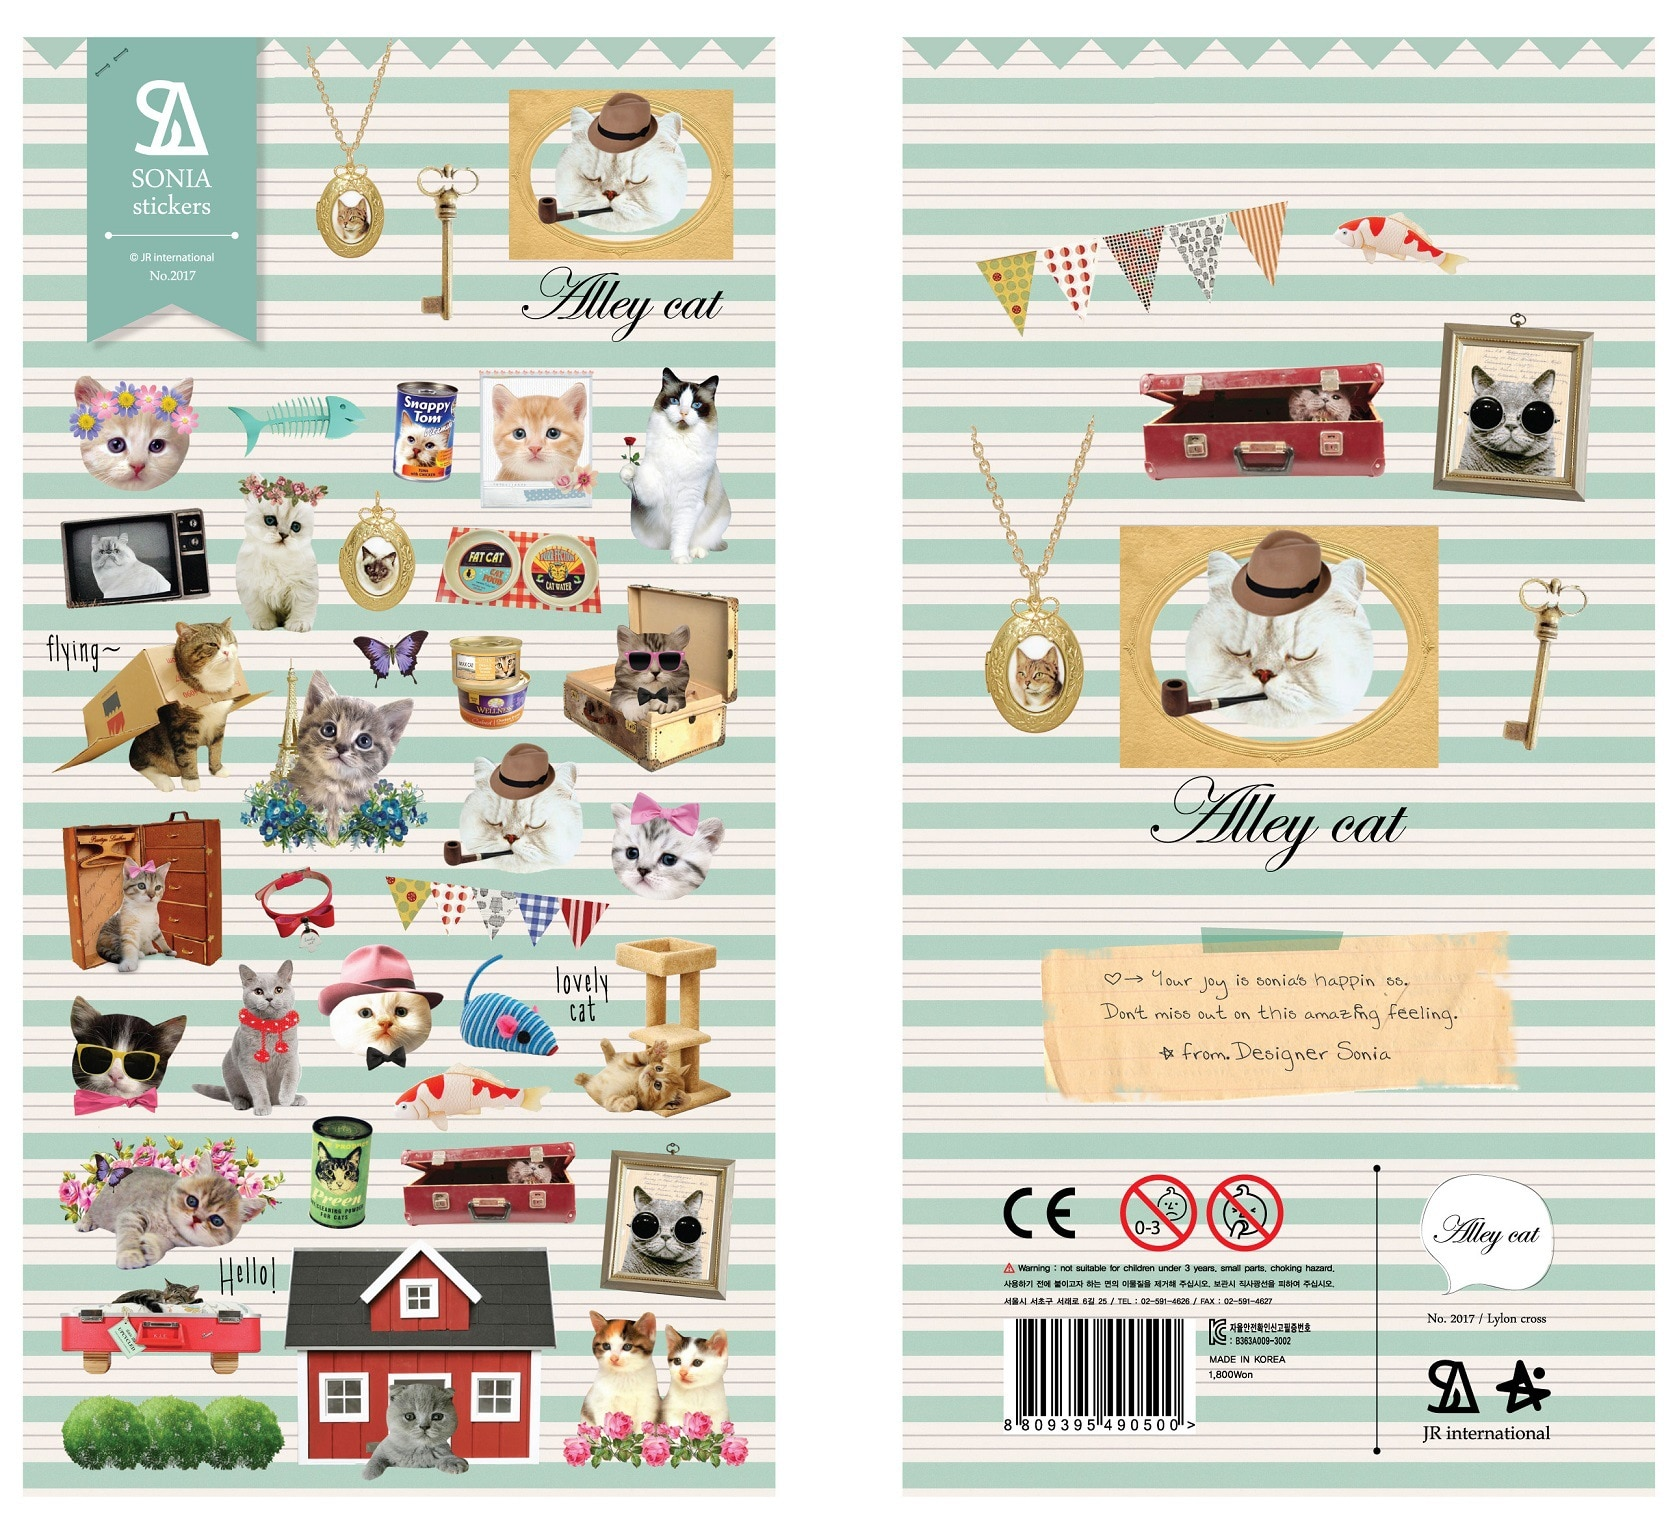 Coreano importación lindo Pequeño gato hogar papelería pegatinas Scrapbooking DIY suministros diario pegatinas escuela Oficina